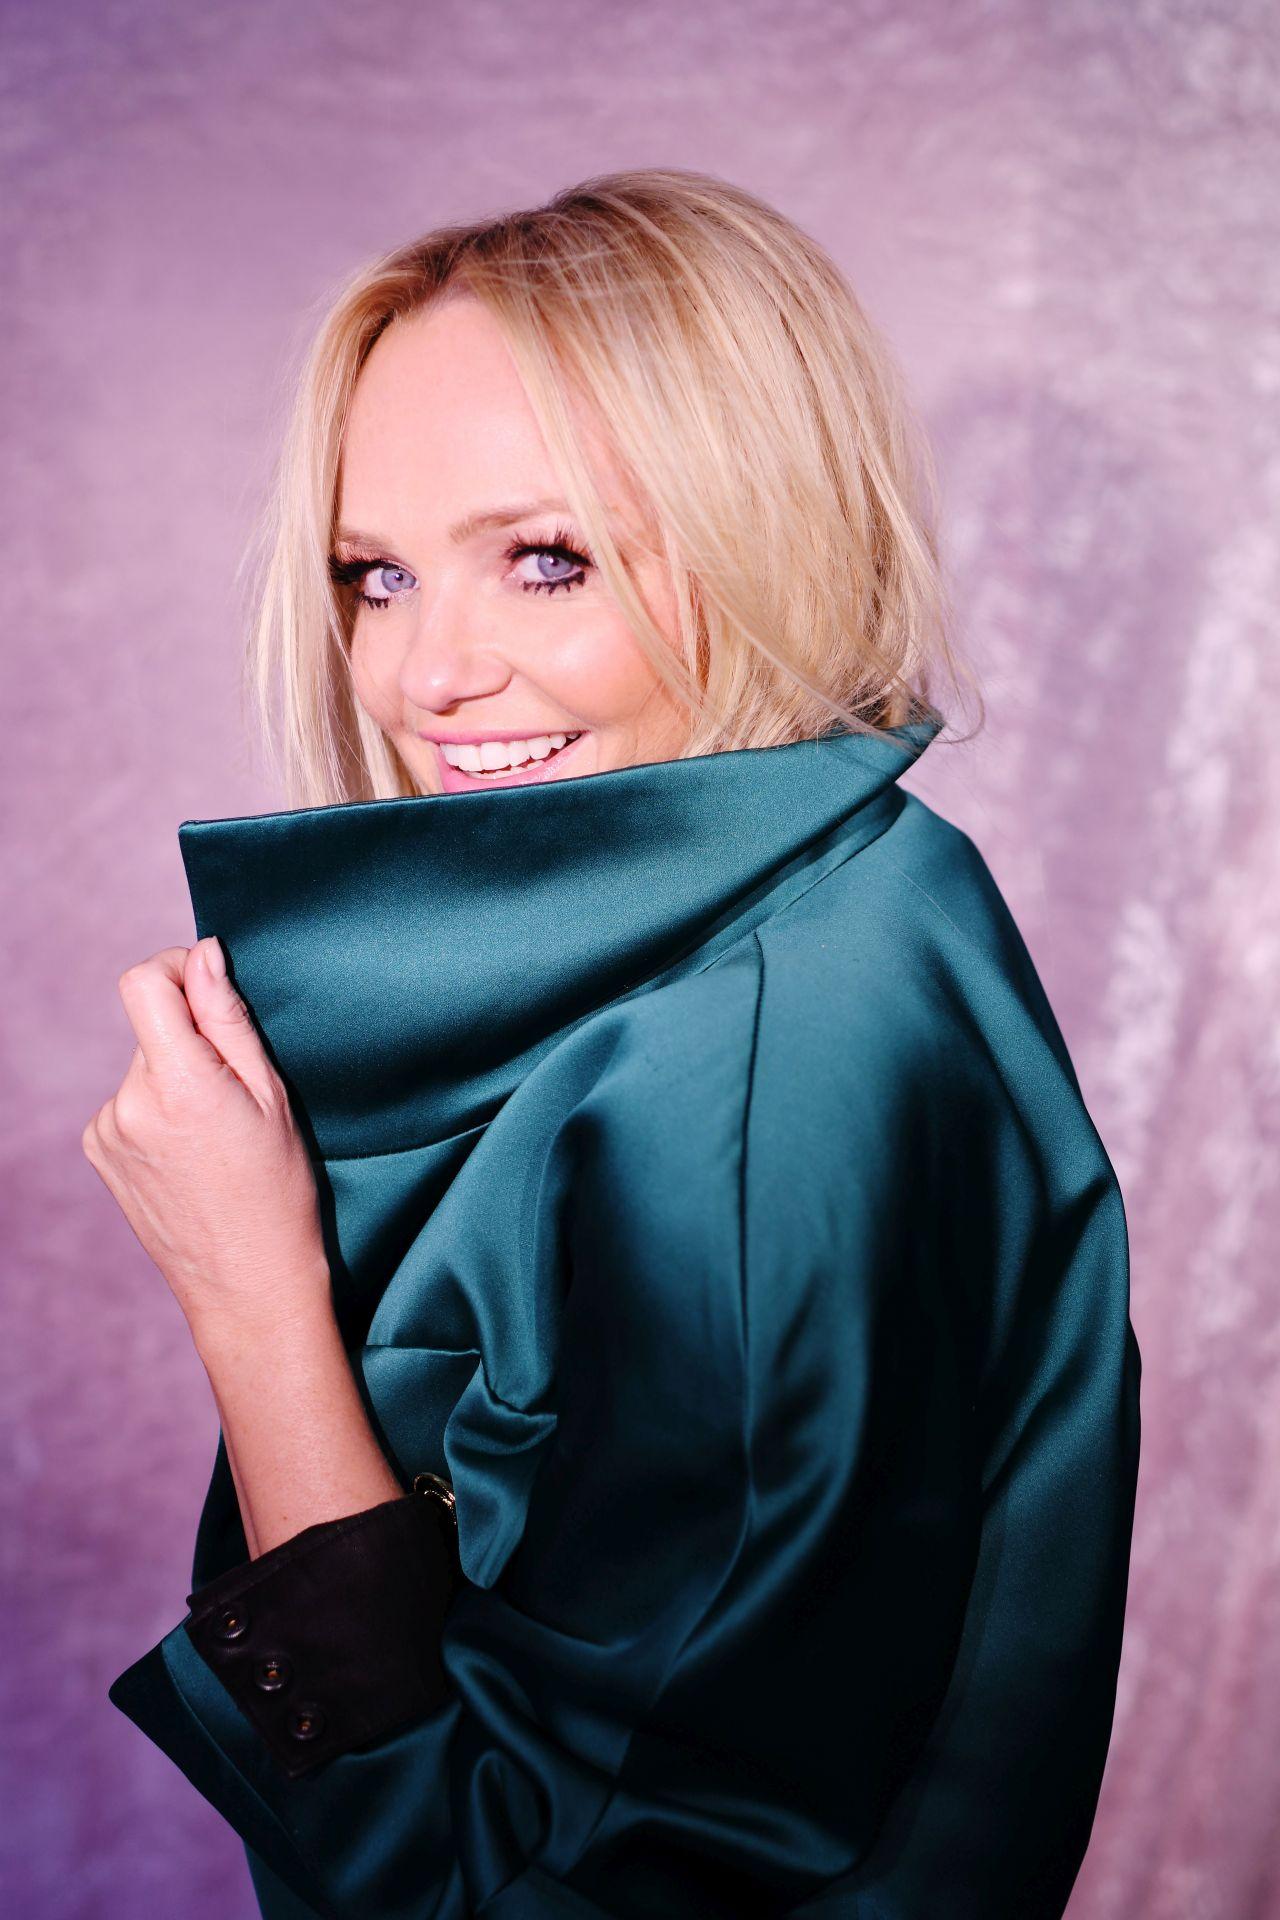 Emma Bunton Photoshoot 2019